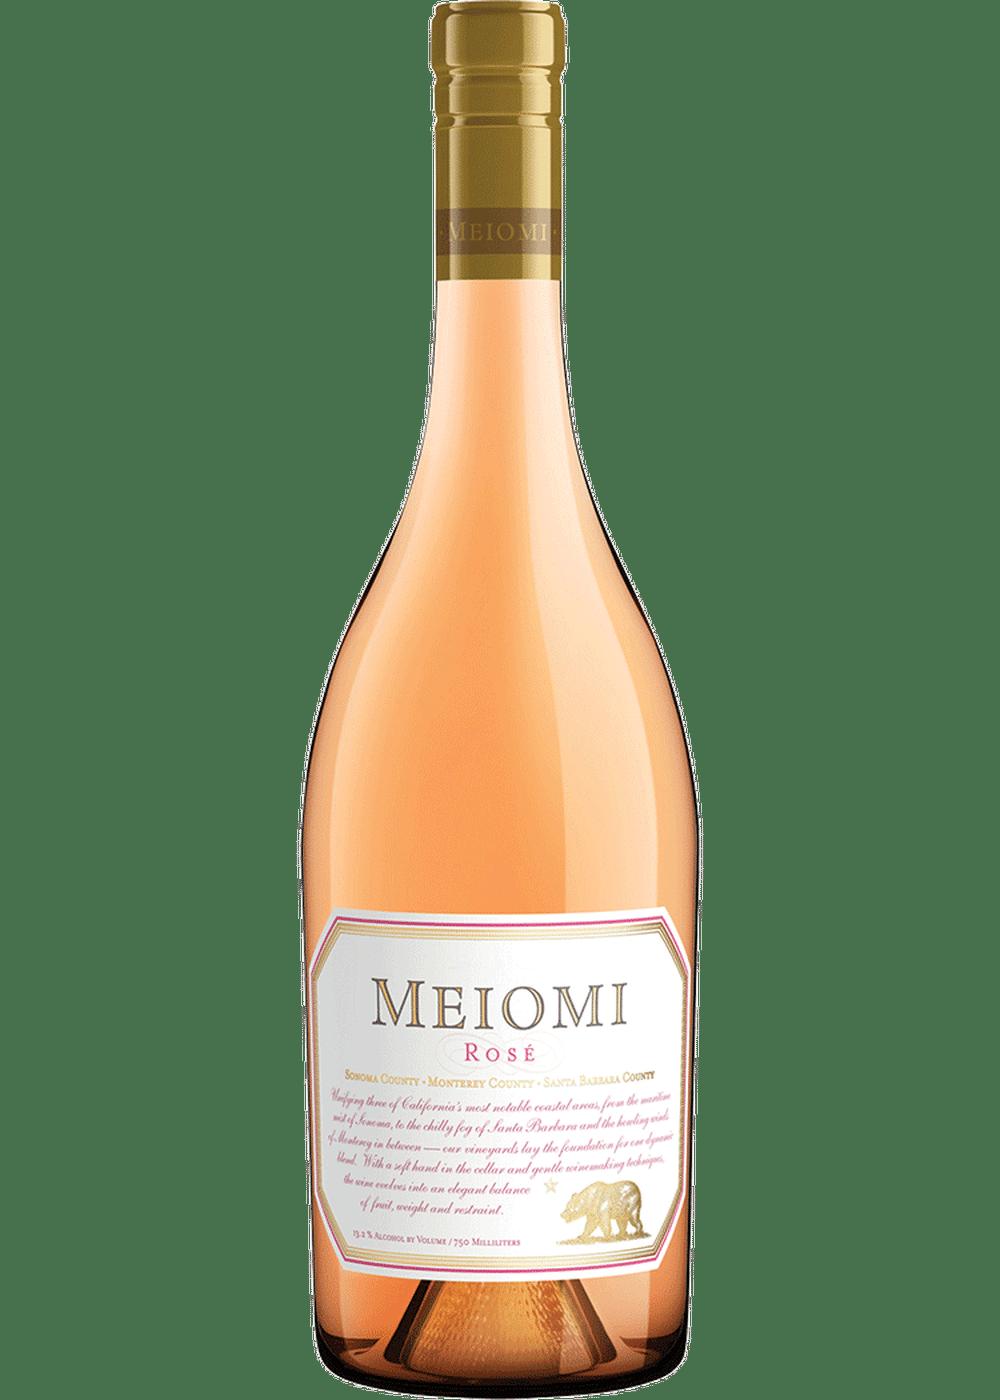 Meiomi Rose 750ml NV